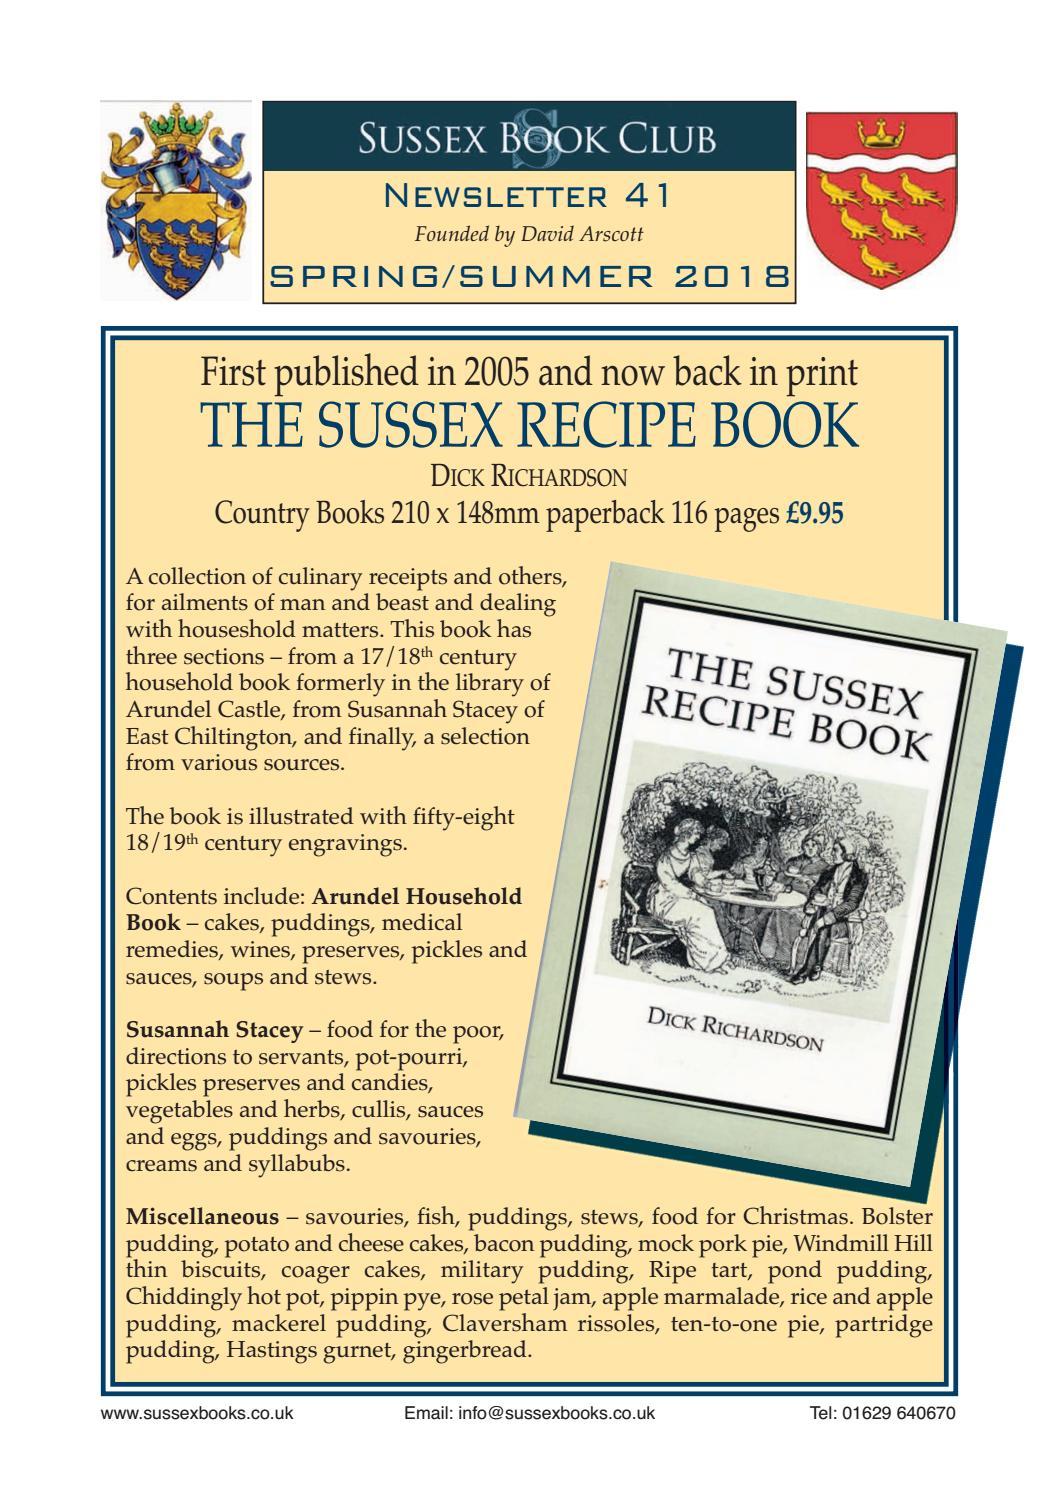 Sussex Book Club Spring/Summer 2018 Newsletter 41 by Sussex